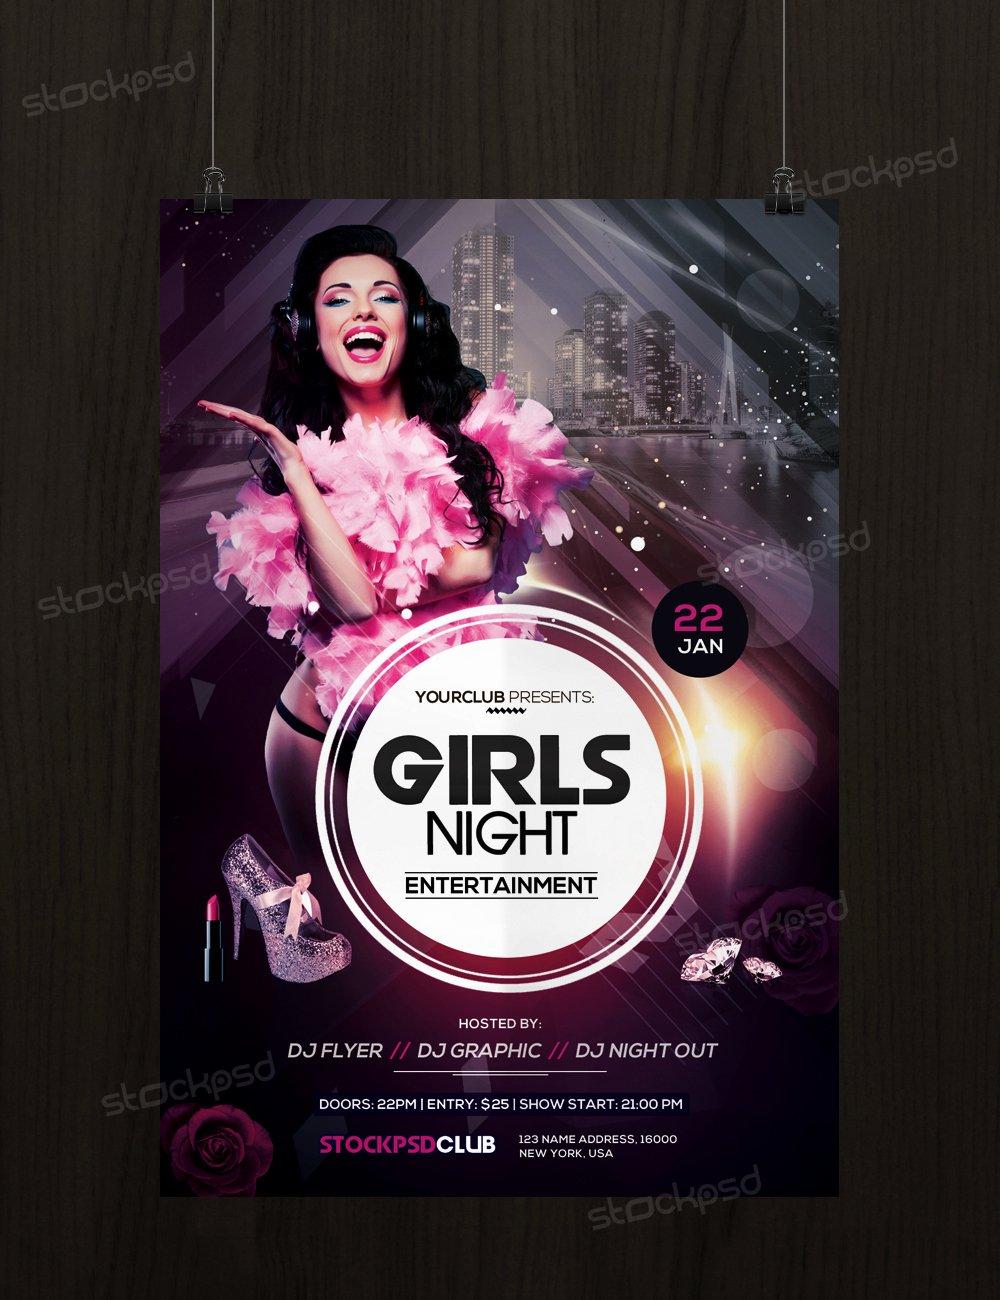 Get Girls Night Flyer Template Flyershitter